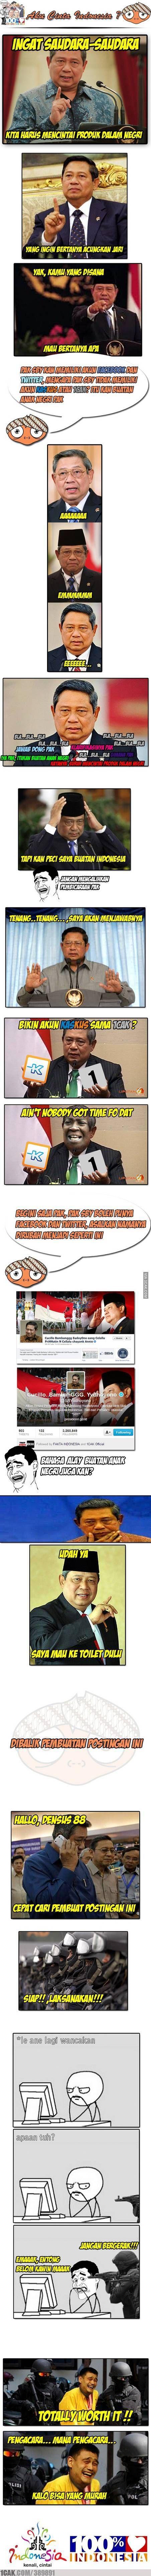 Rapor Merah Joko Meme Politics Pinterest